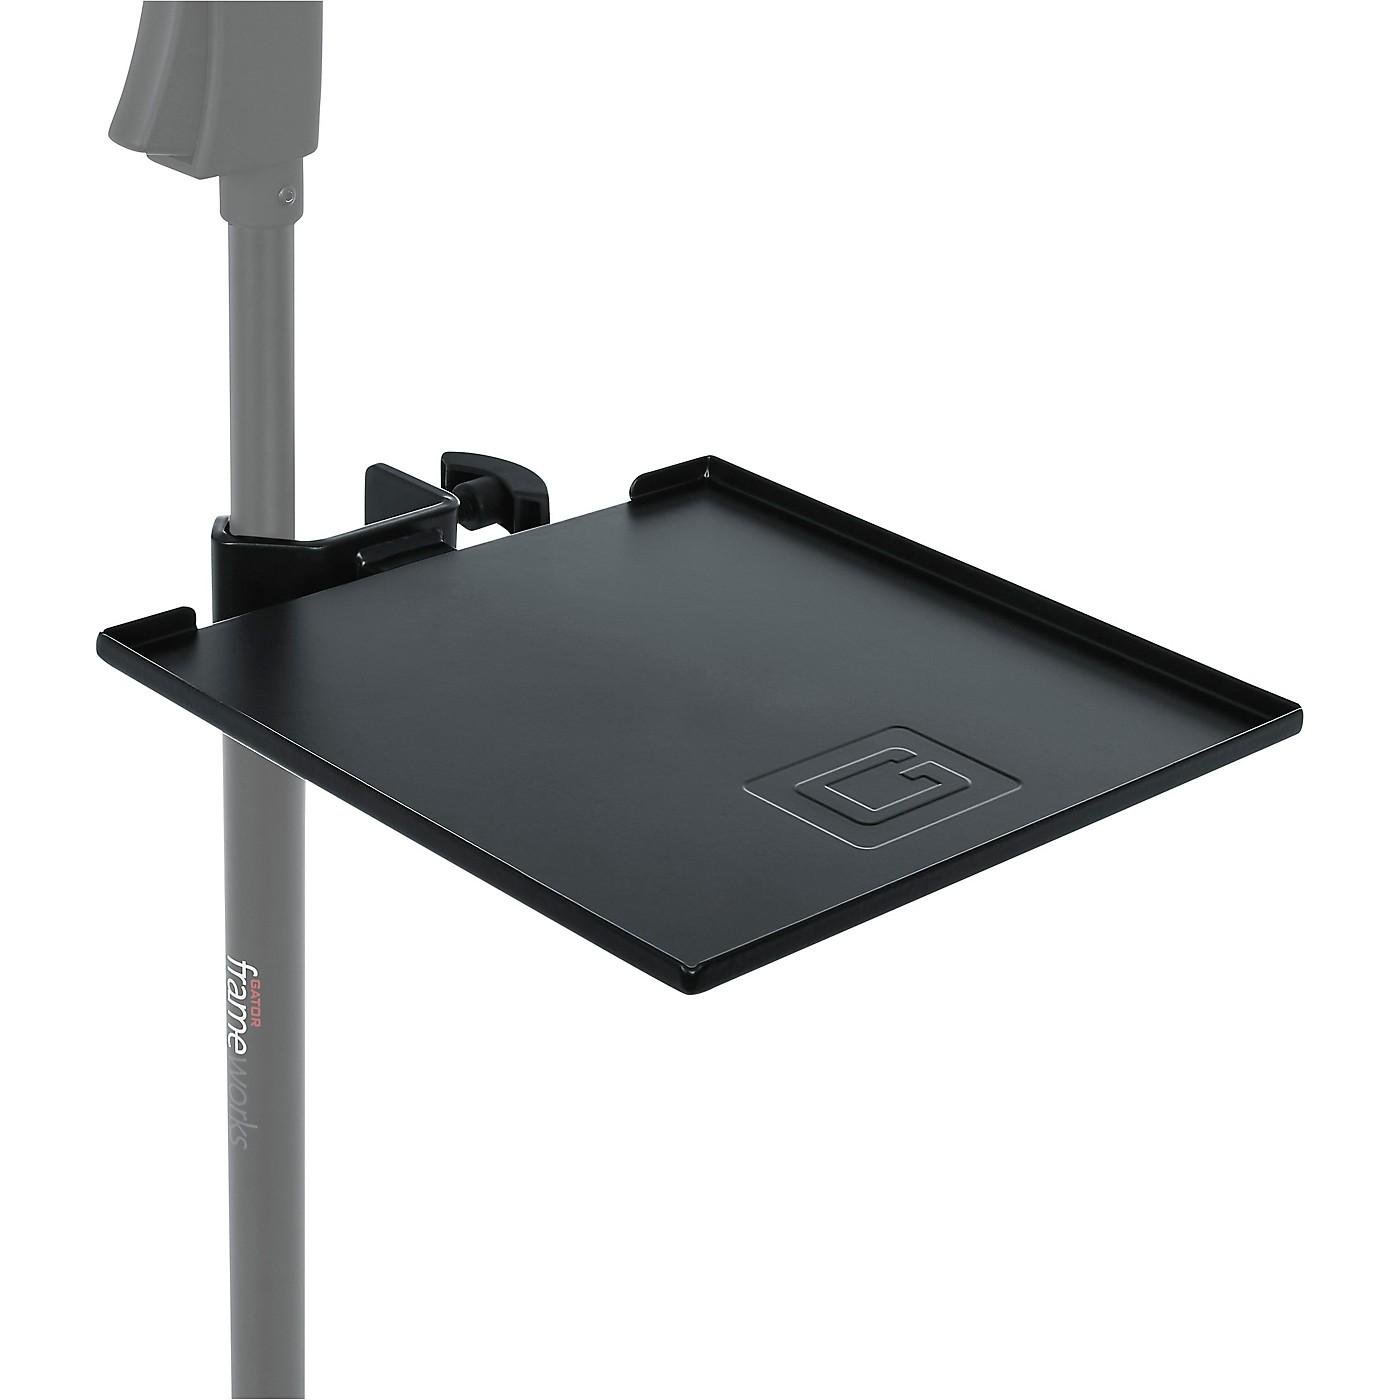 Gator GFW-SHELF0909 Gator Frameworks small microphone stand clamp-on utility shelf, capacity up to 10lbs. thumbnail